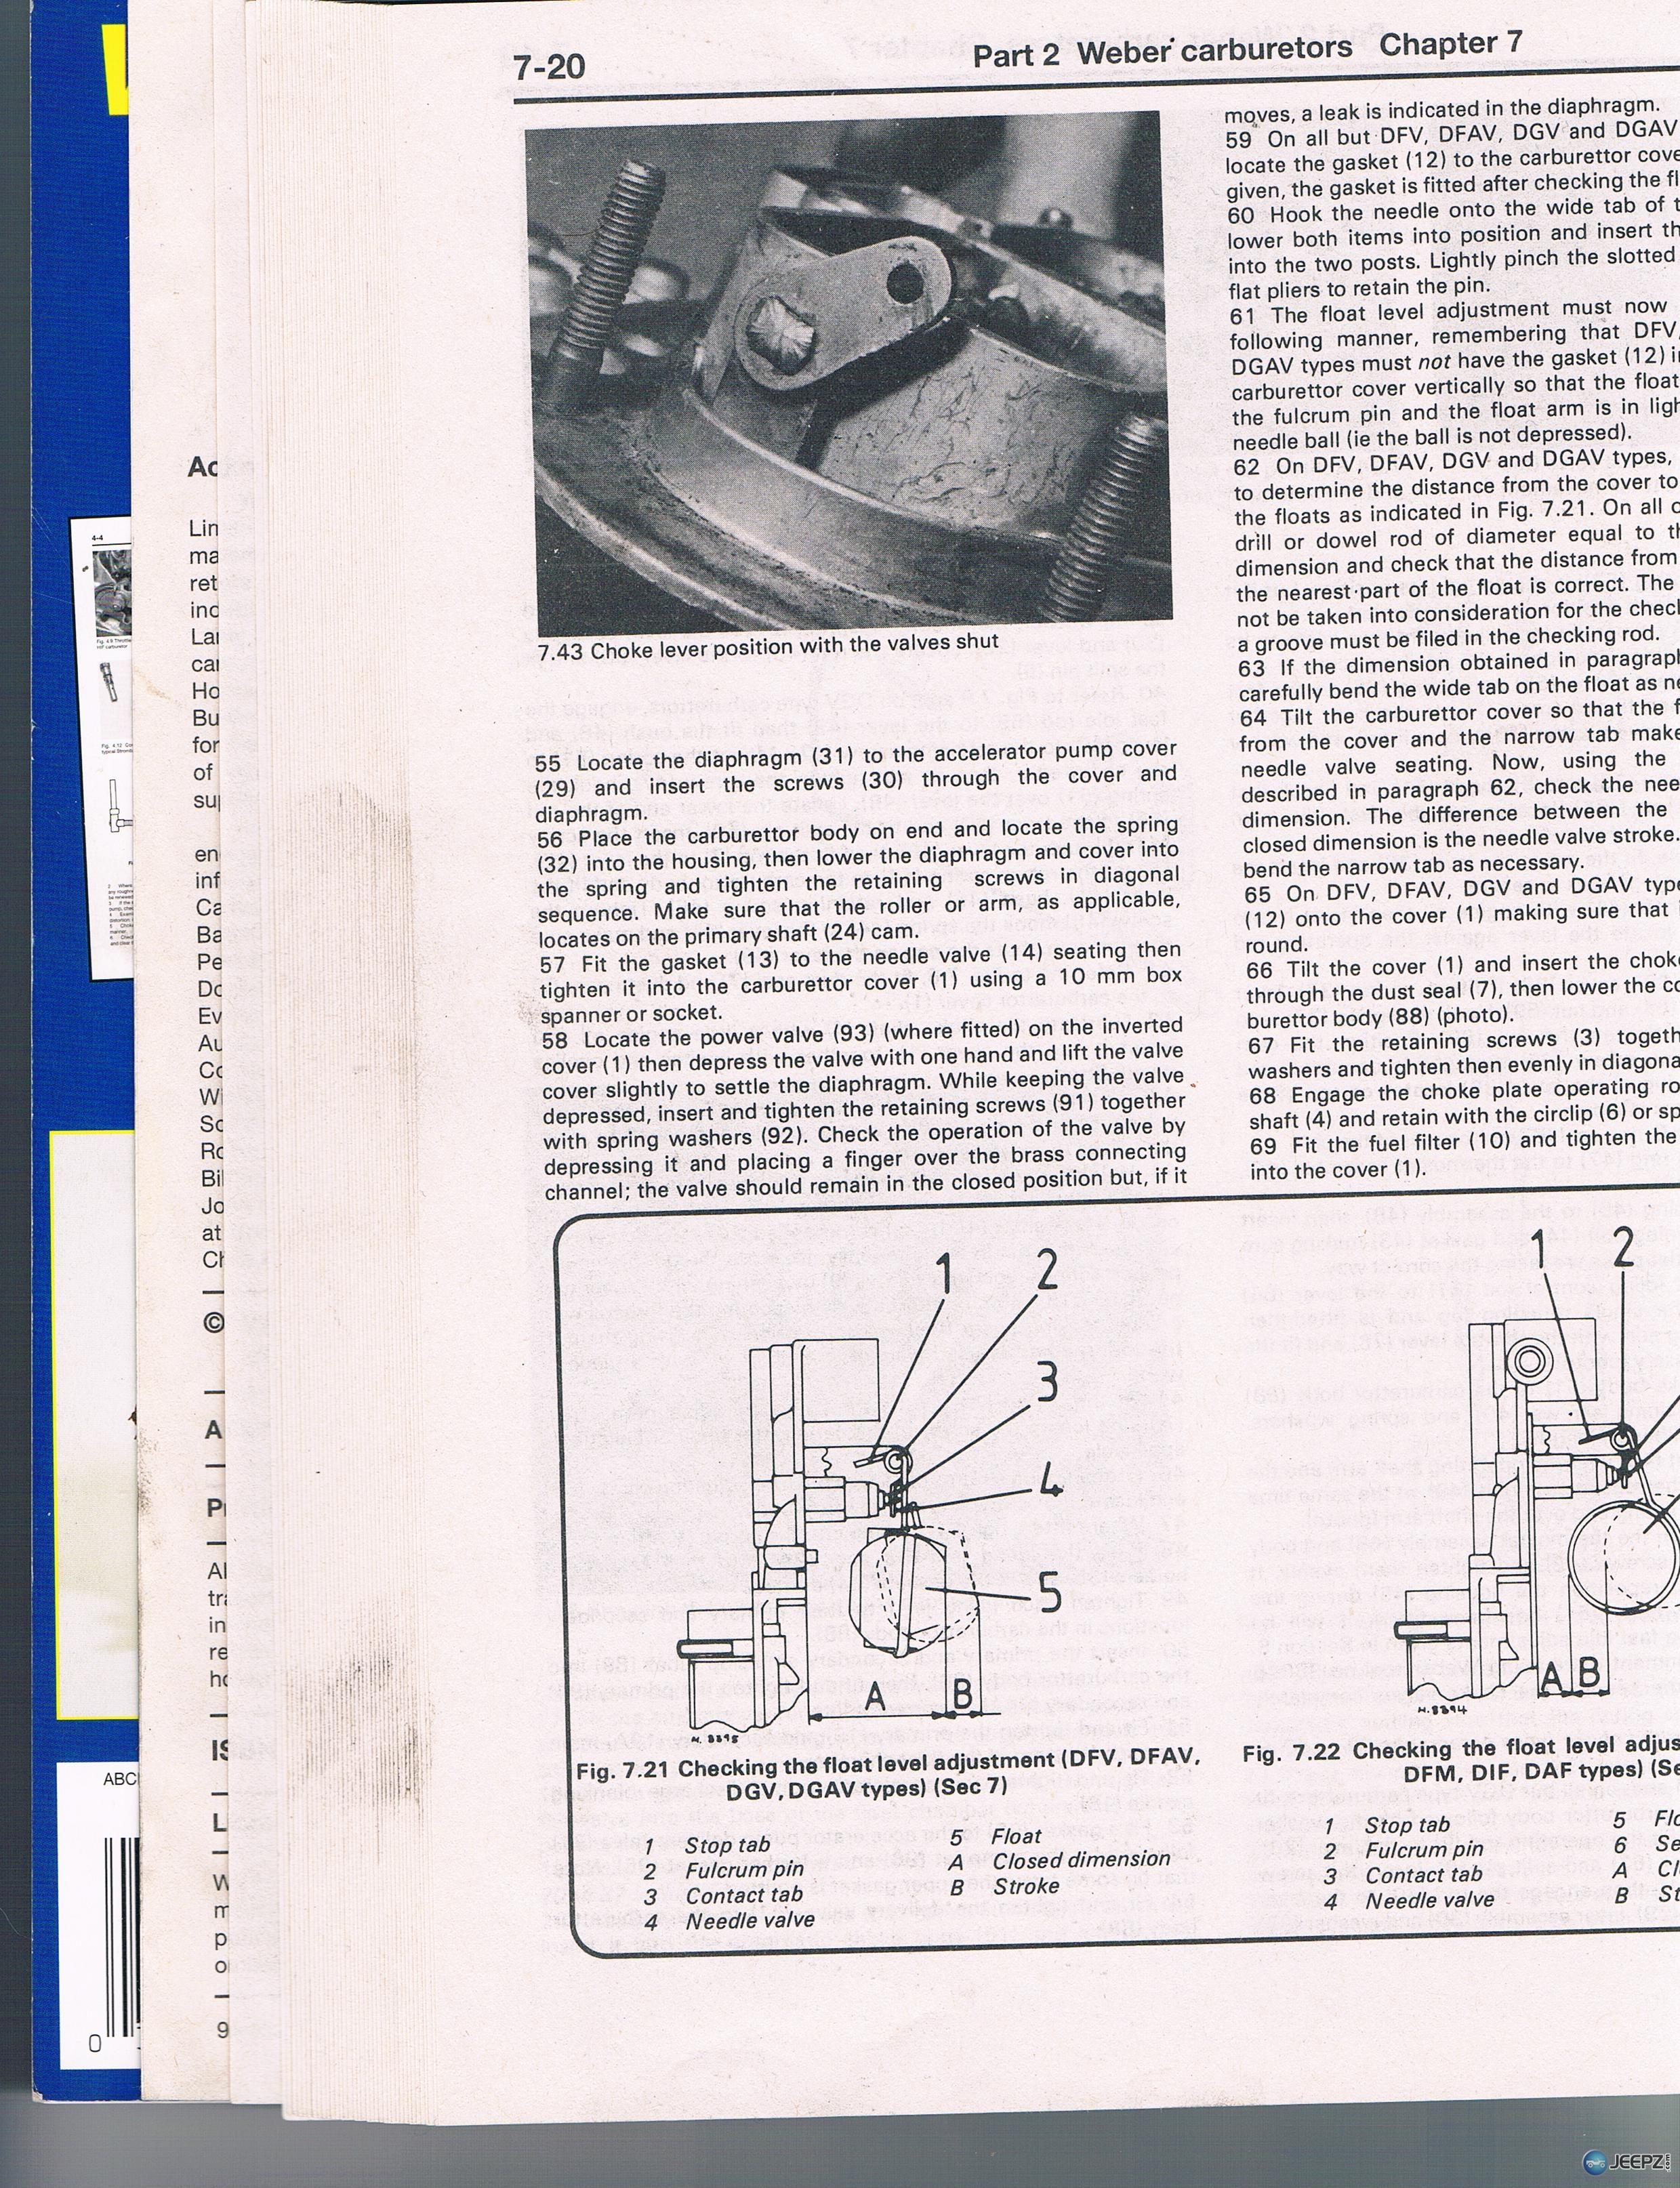 Weber 32 36 dgev carburator - Page 2